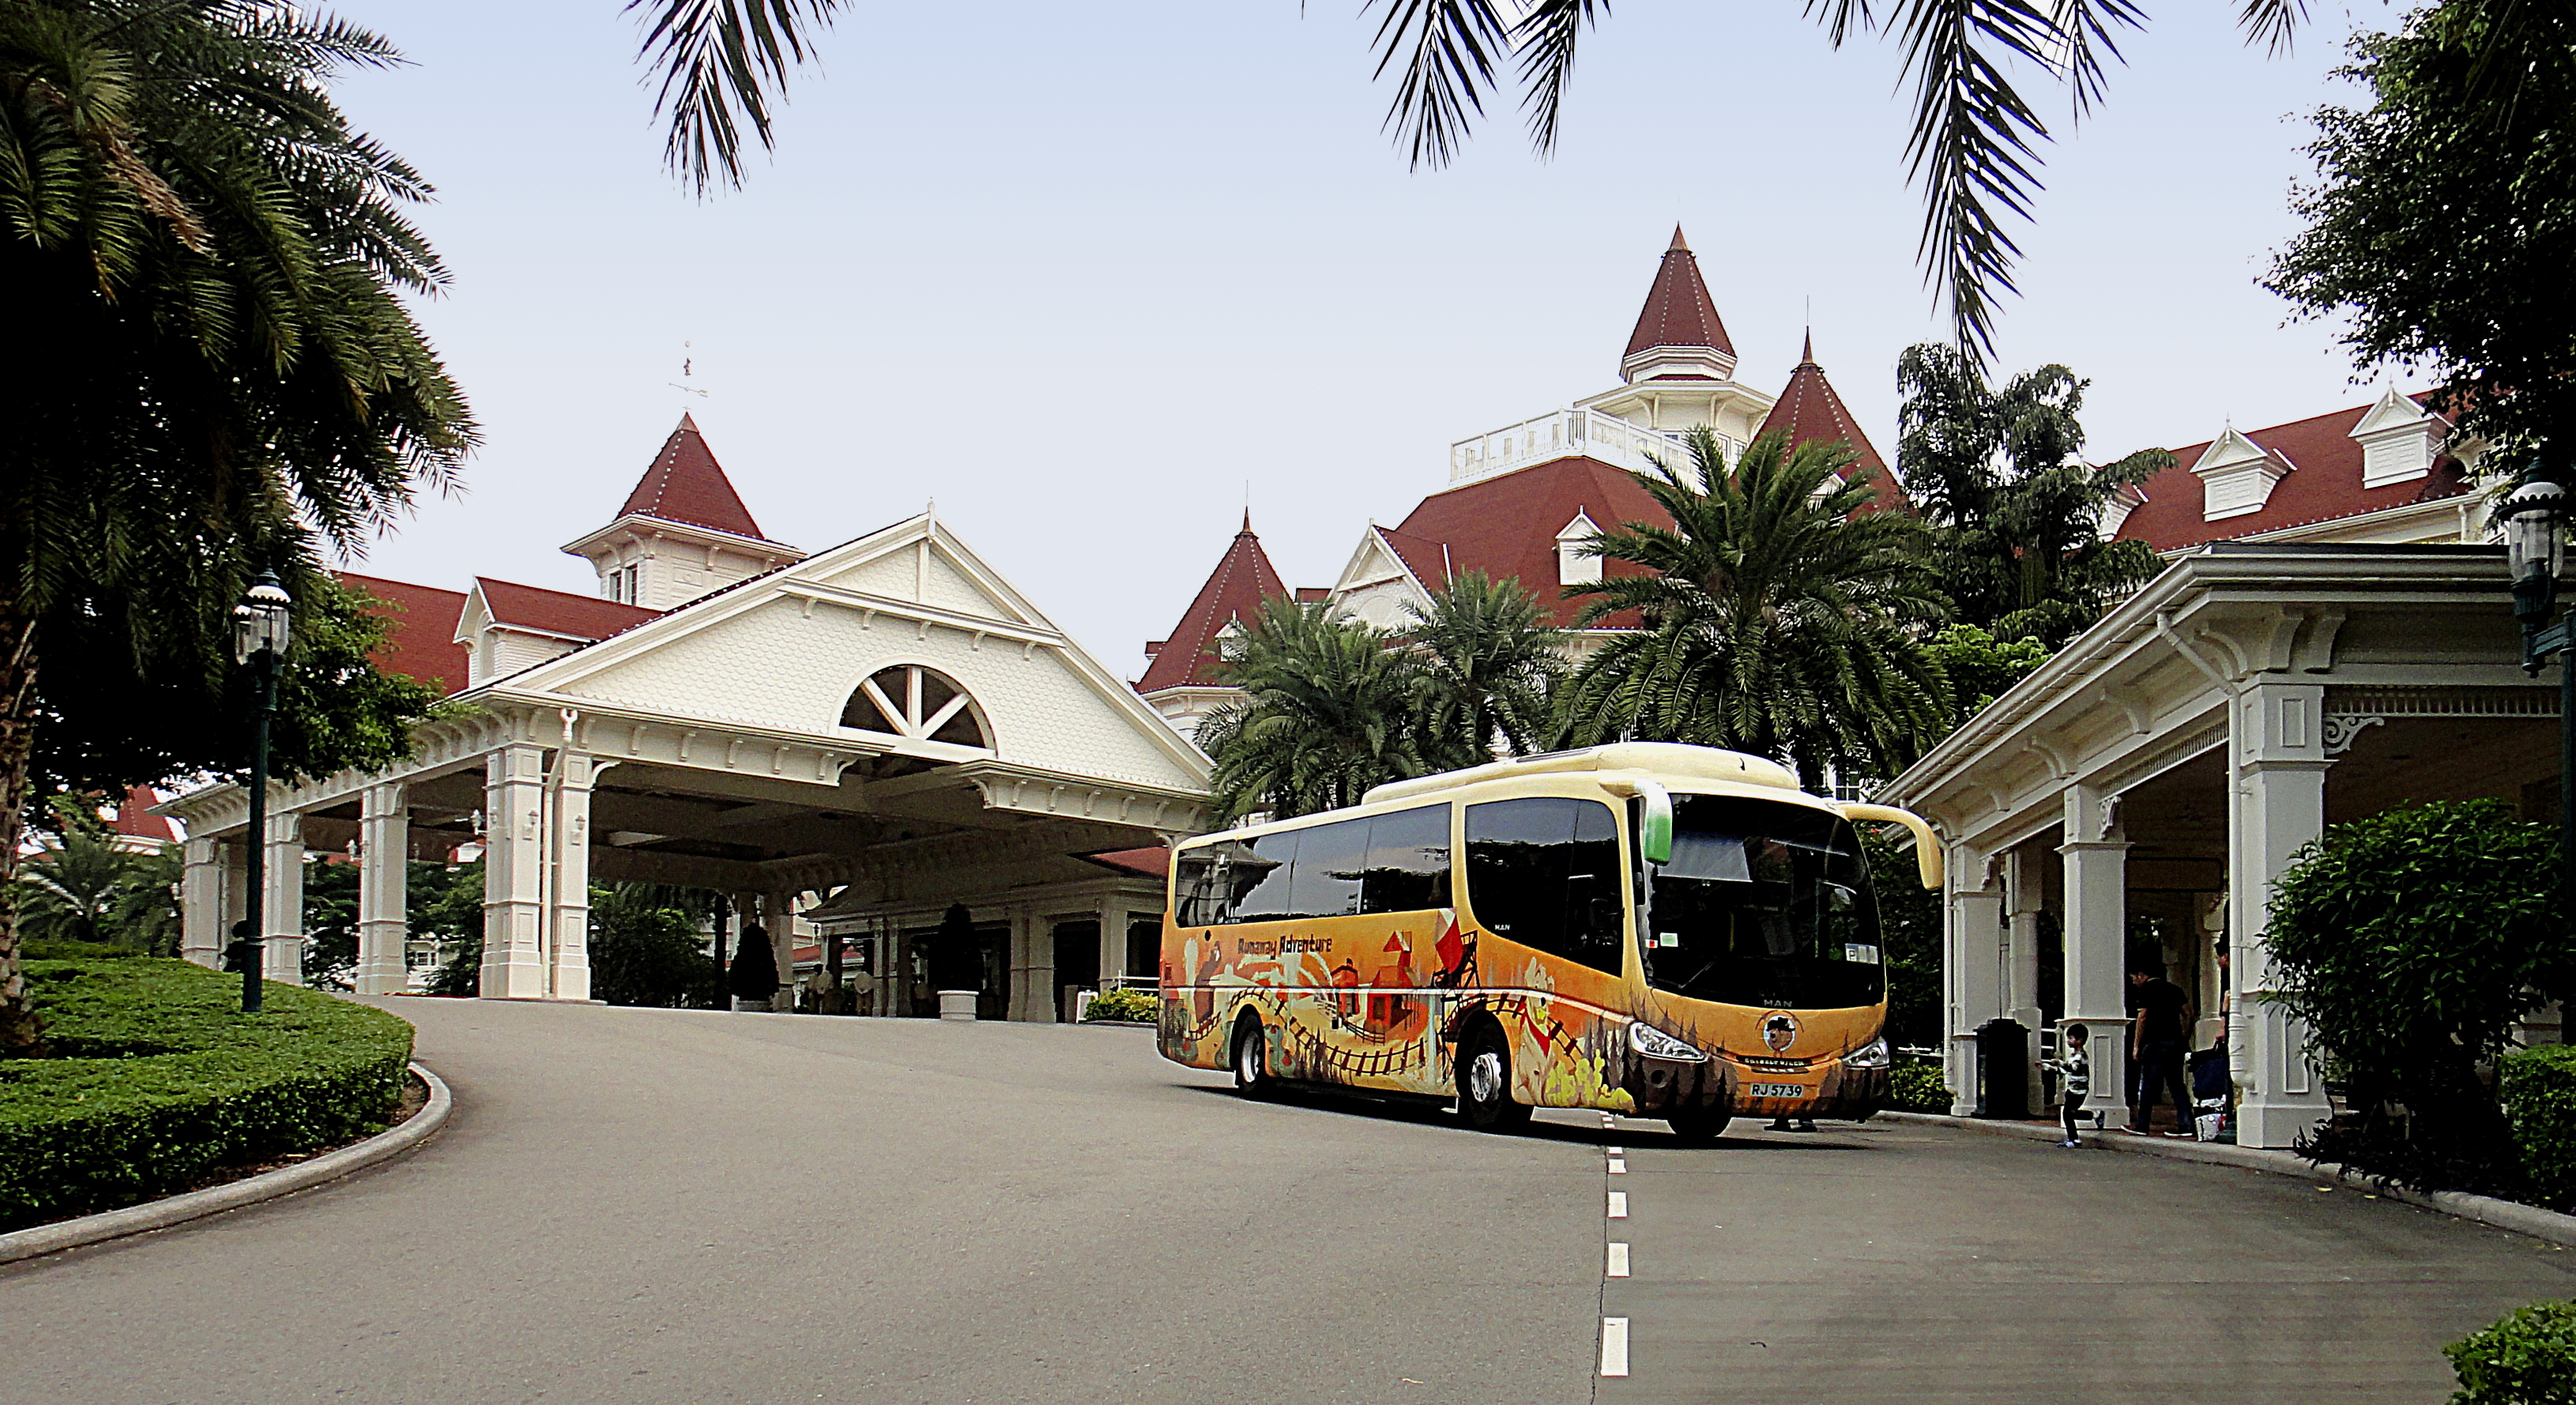 File:Front view of Disneyland Hotel, HK.JPG - Wikimedia Commons